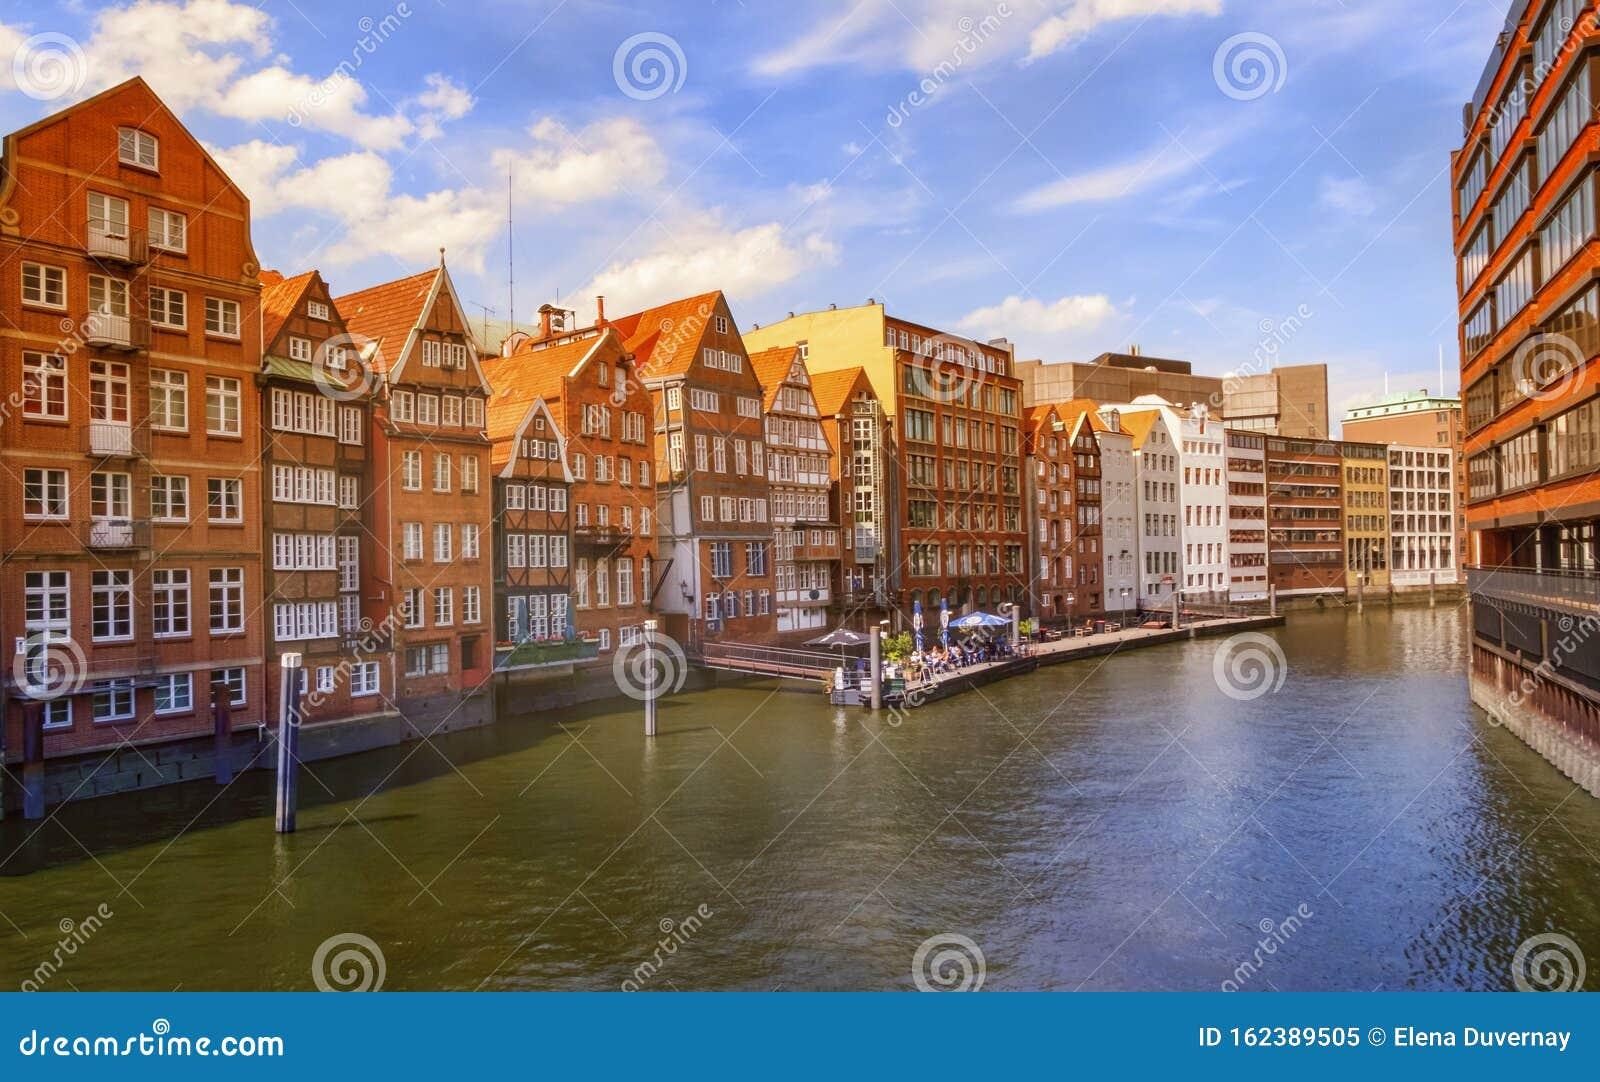 Nikolaifleet canal in the Altstadt of Hamburg, Germany